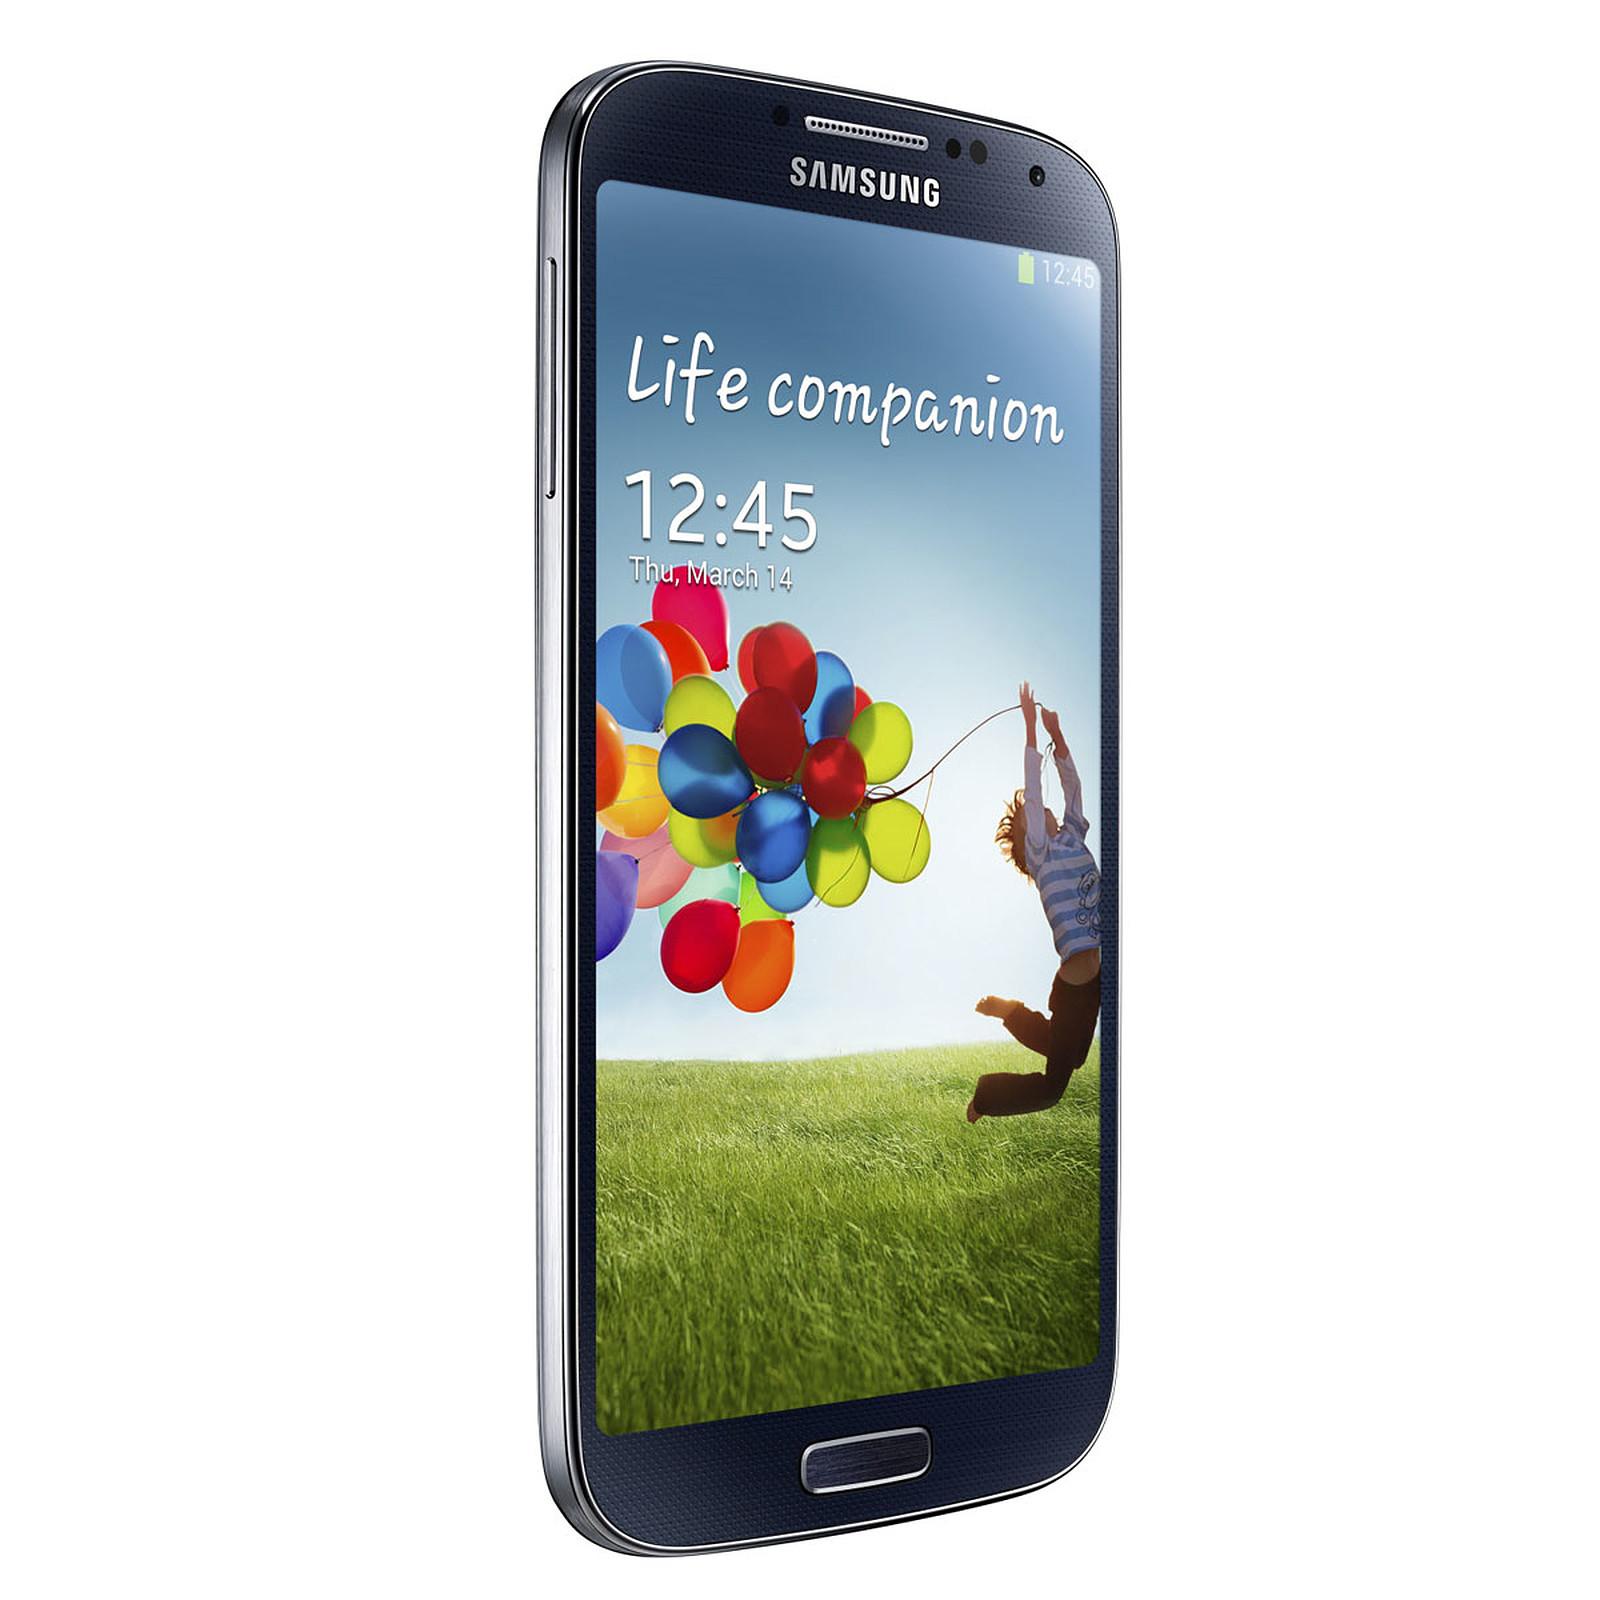 Samsung Galaxy S4 GT-i9505 Black Mist 16 Go - Mobile & smartphone ...